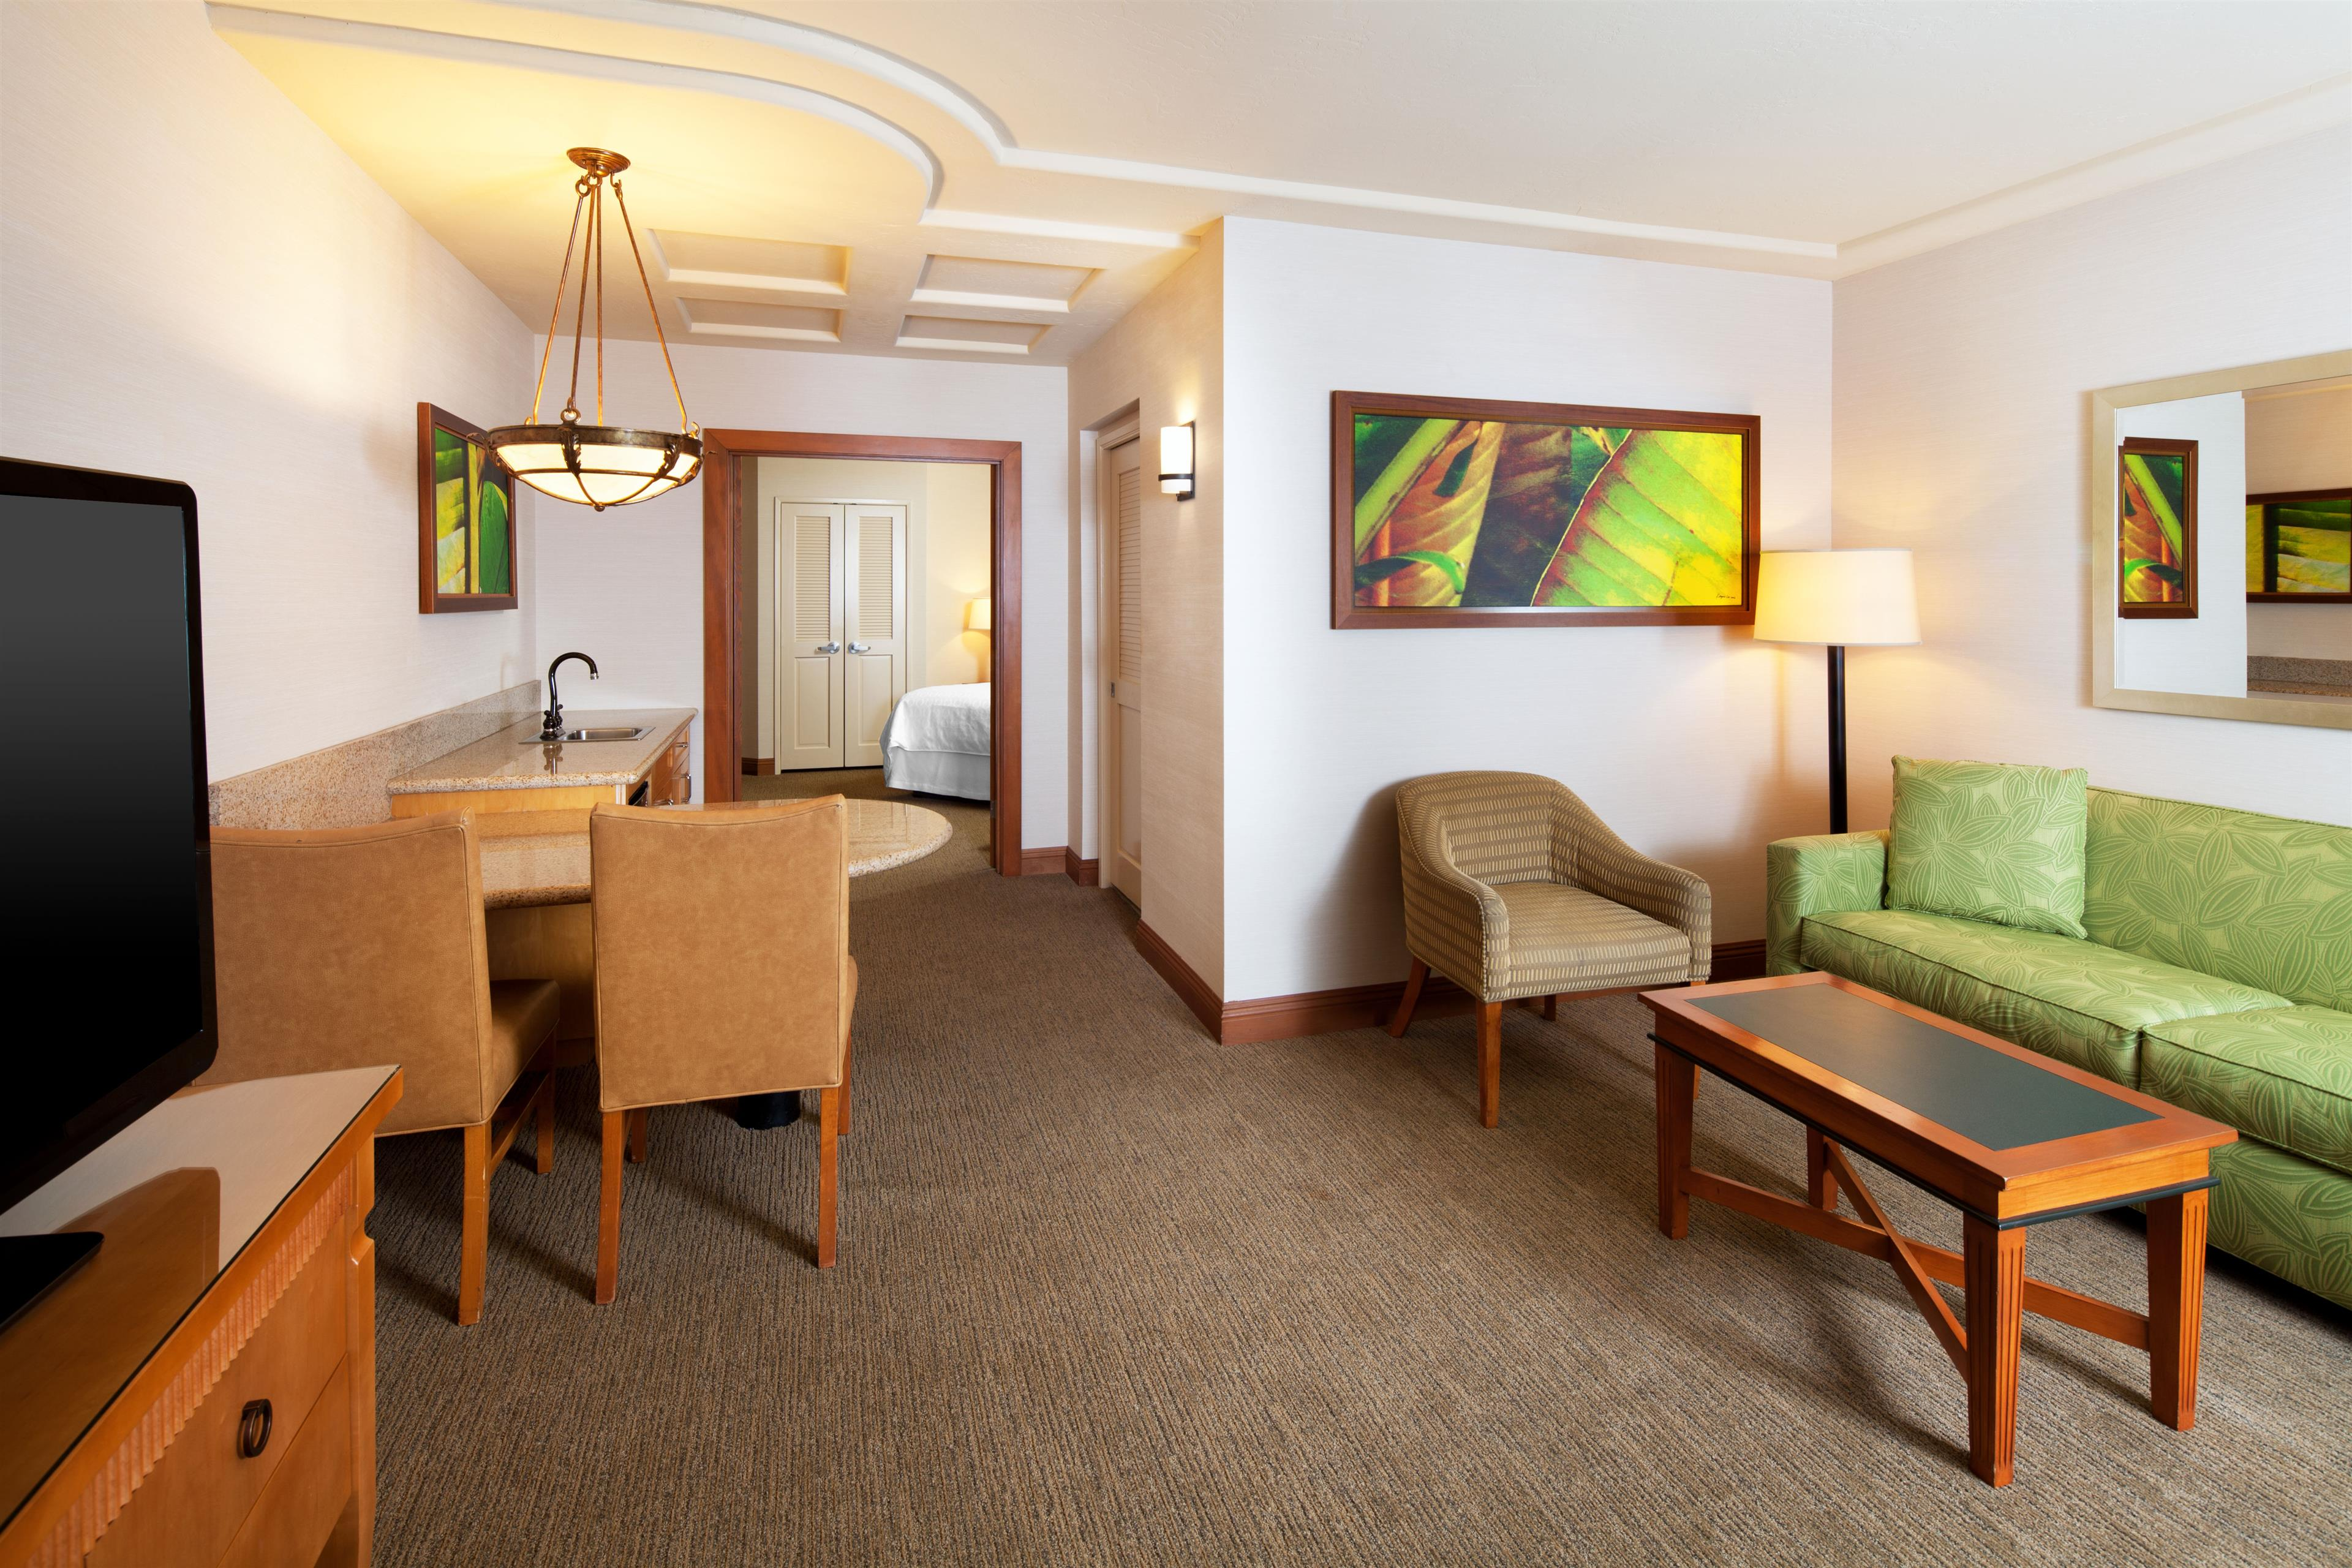 Sheraton La Jolla Hotel image 3